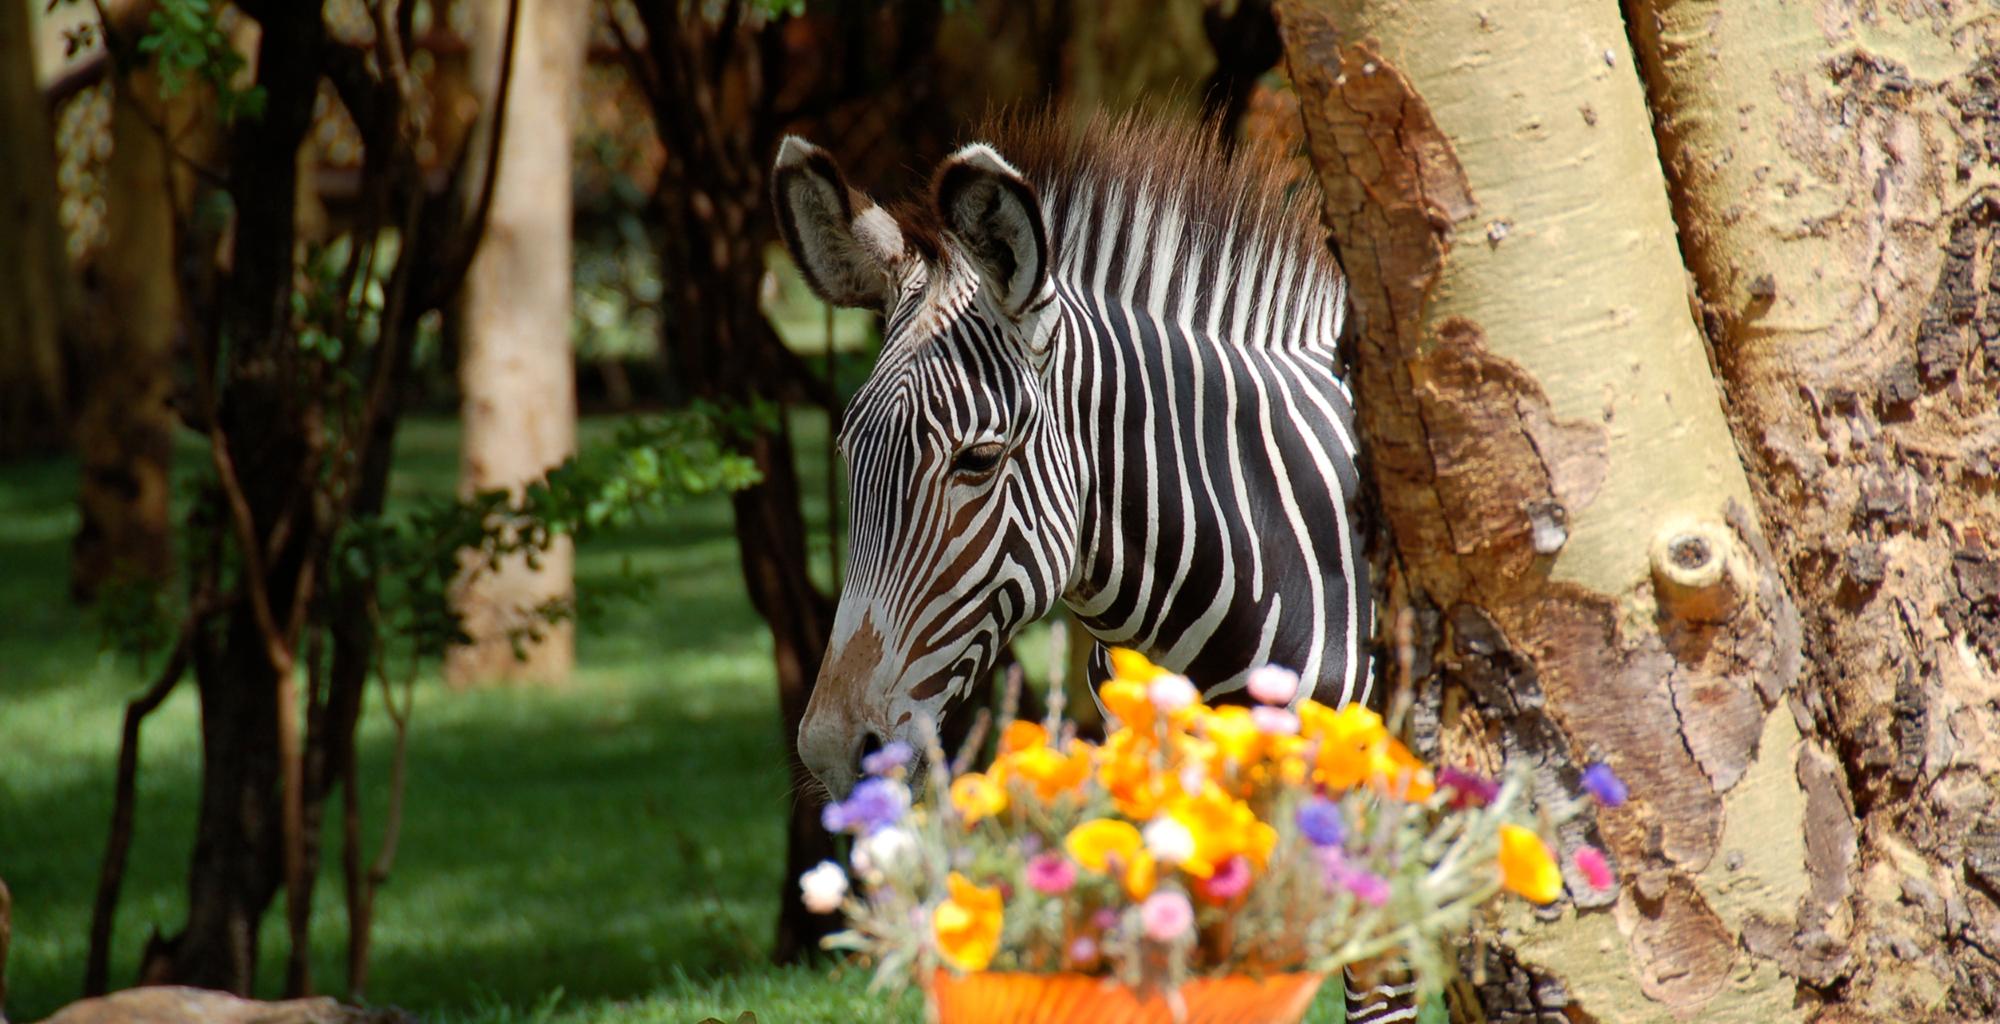 Kenya-Sirikoi-House-Zebra